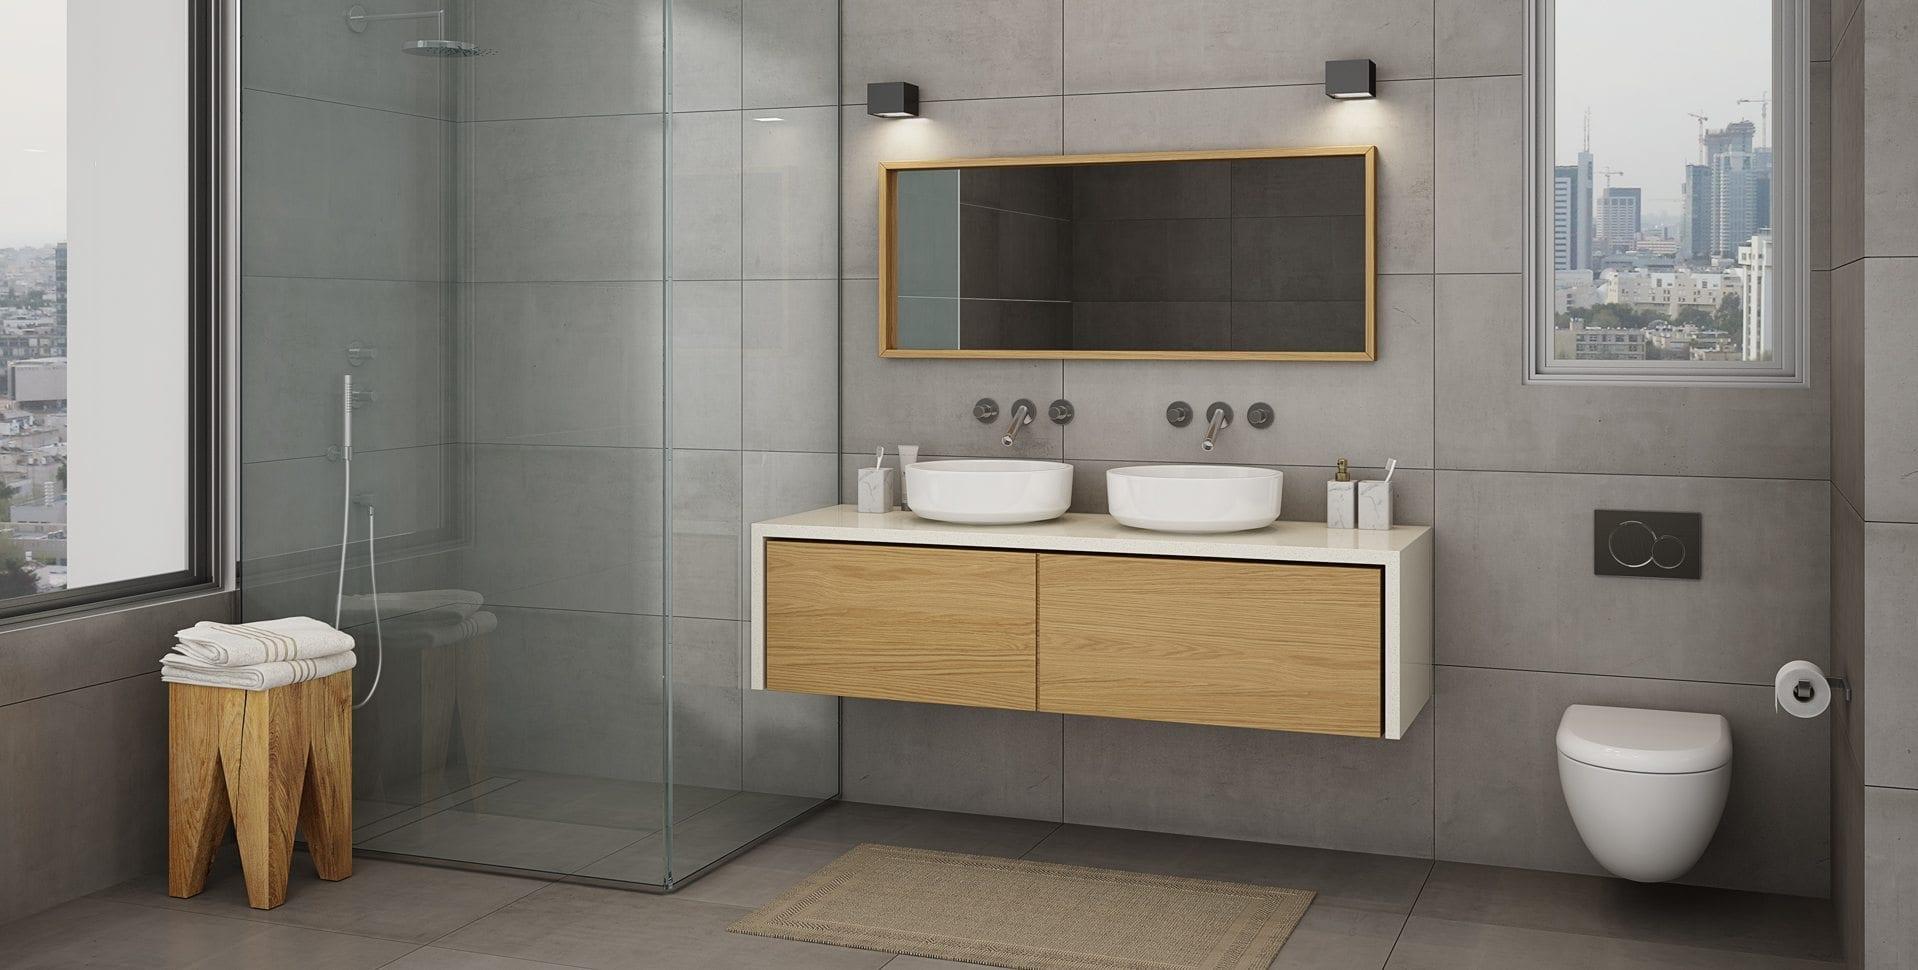 Maayan-Golan_Architectural-Visualization_ penthouse-interior-visualization_bathroom_design-Lior Reuter_01